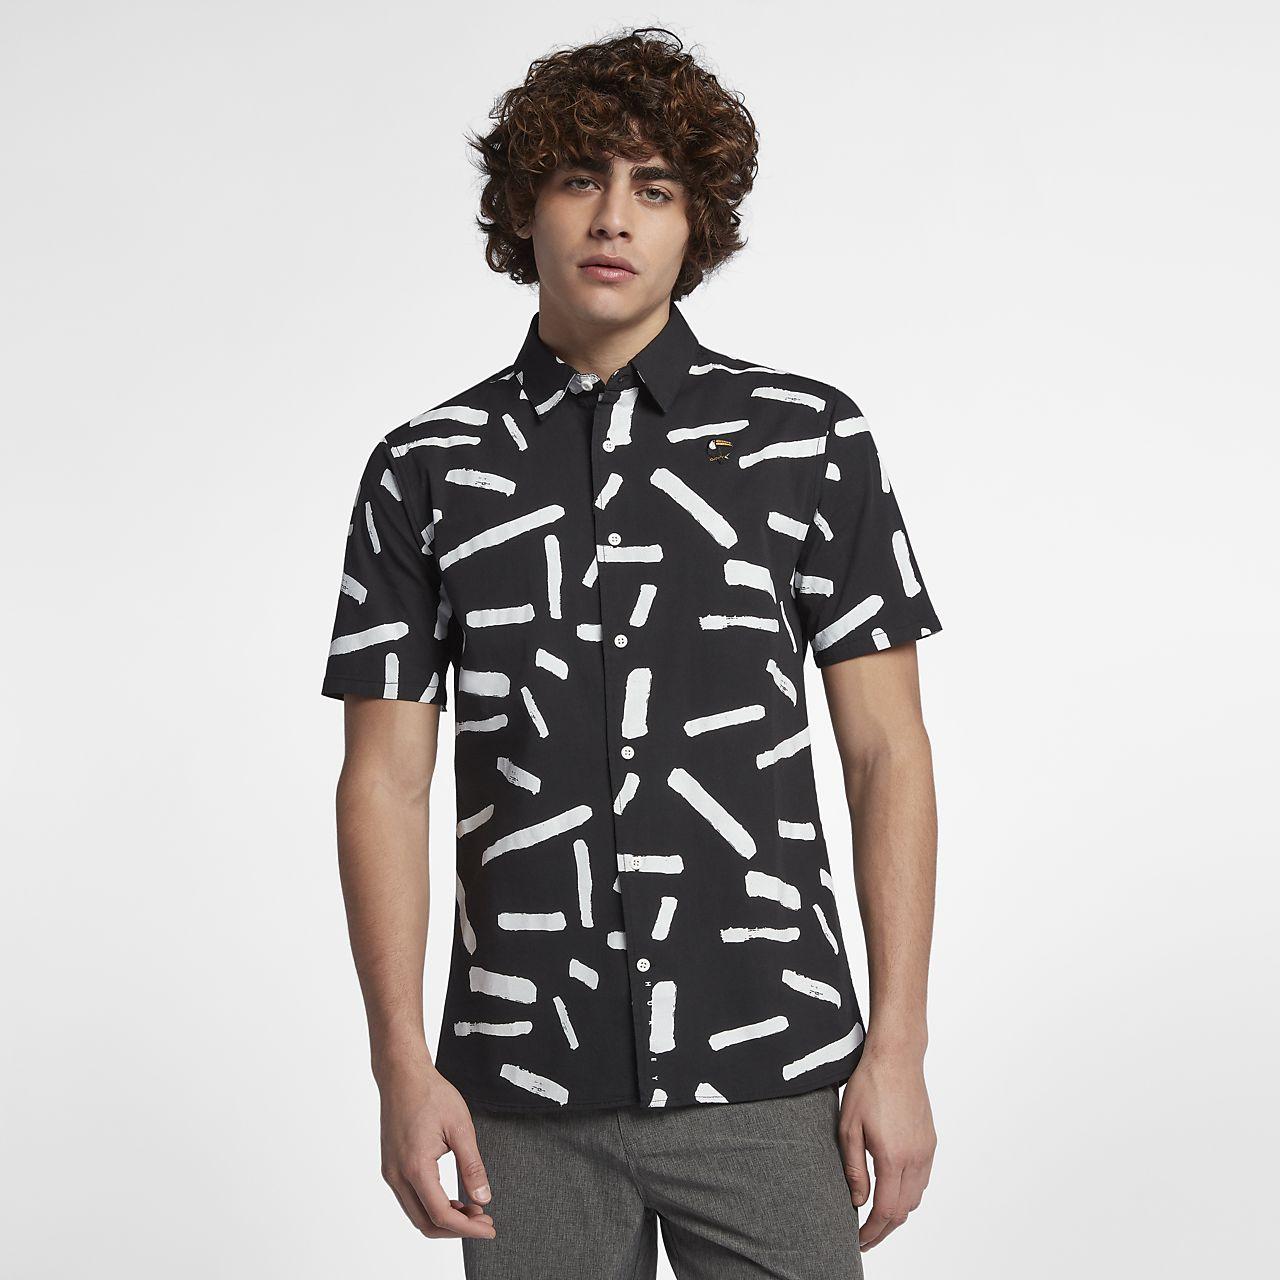 Hurley Bowie Men's Short Sleeve Shirt